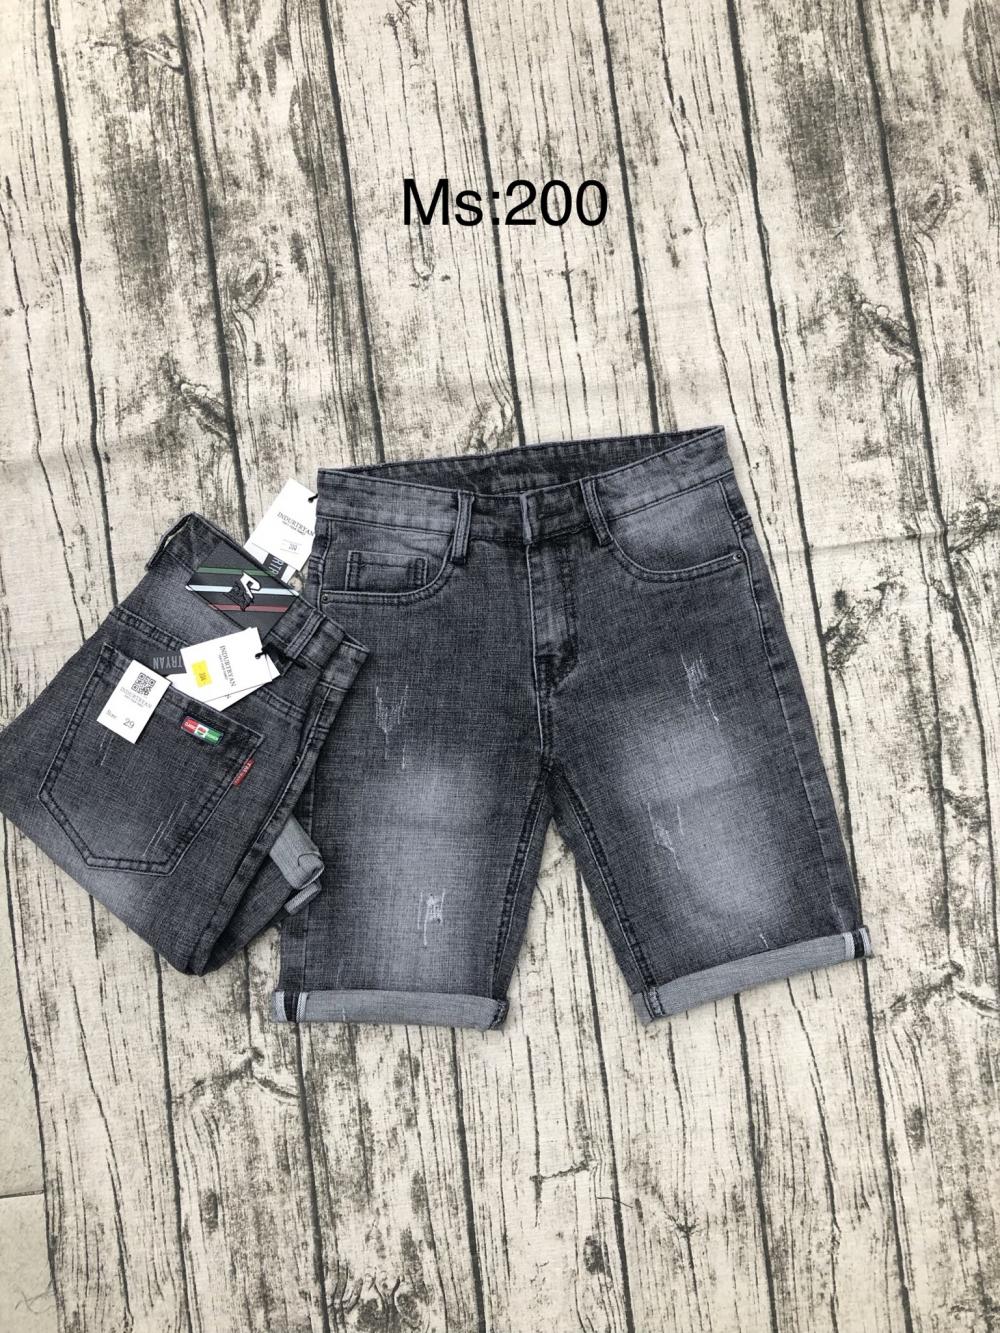 Quần sọt nam MS200